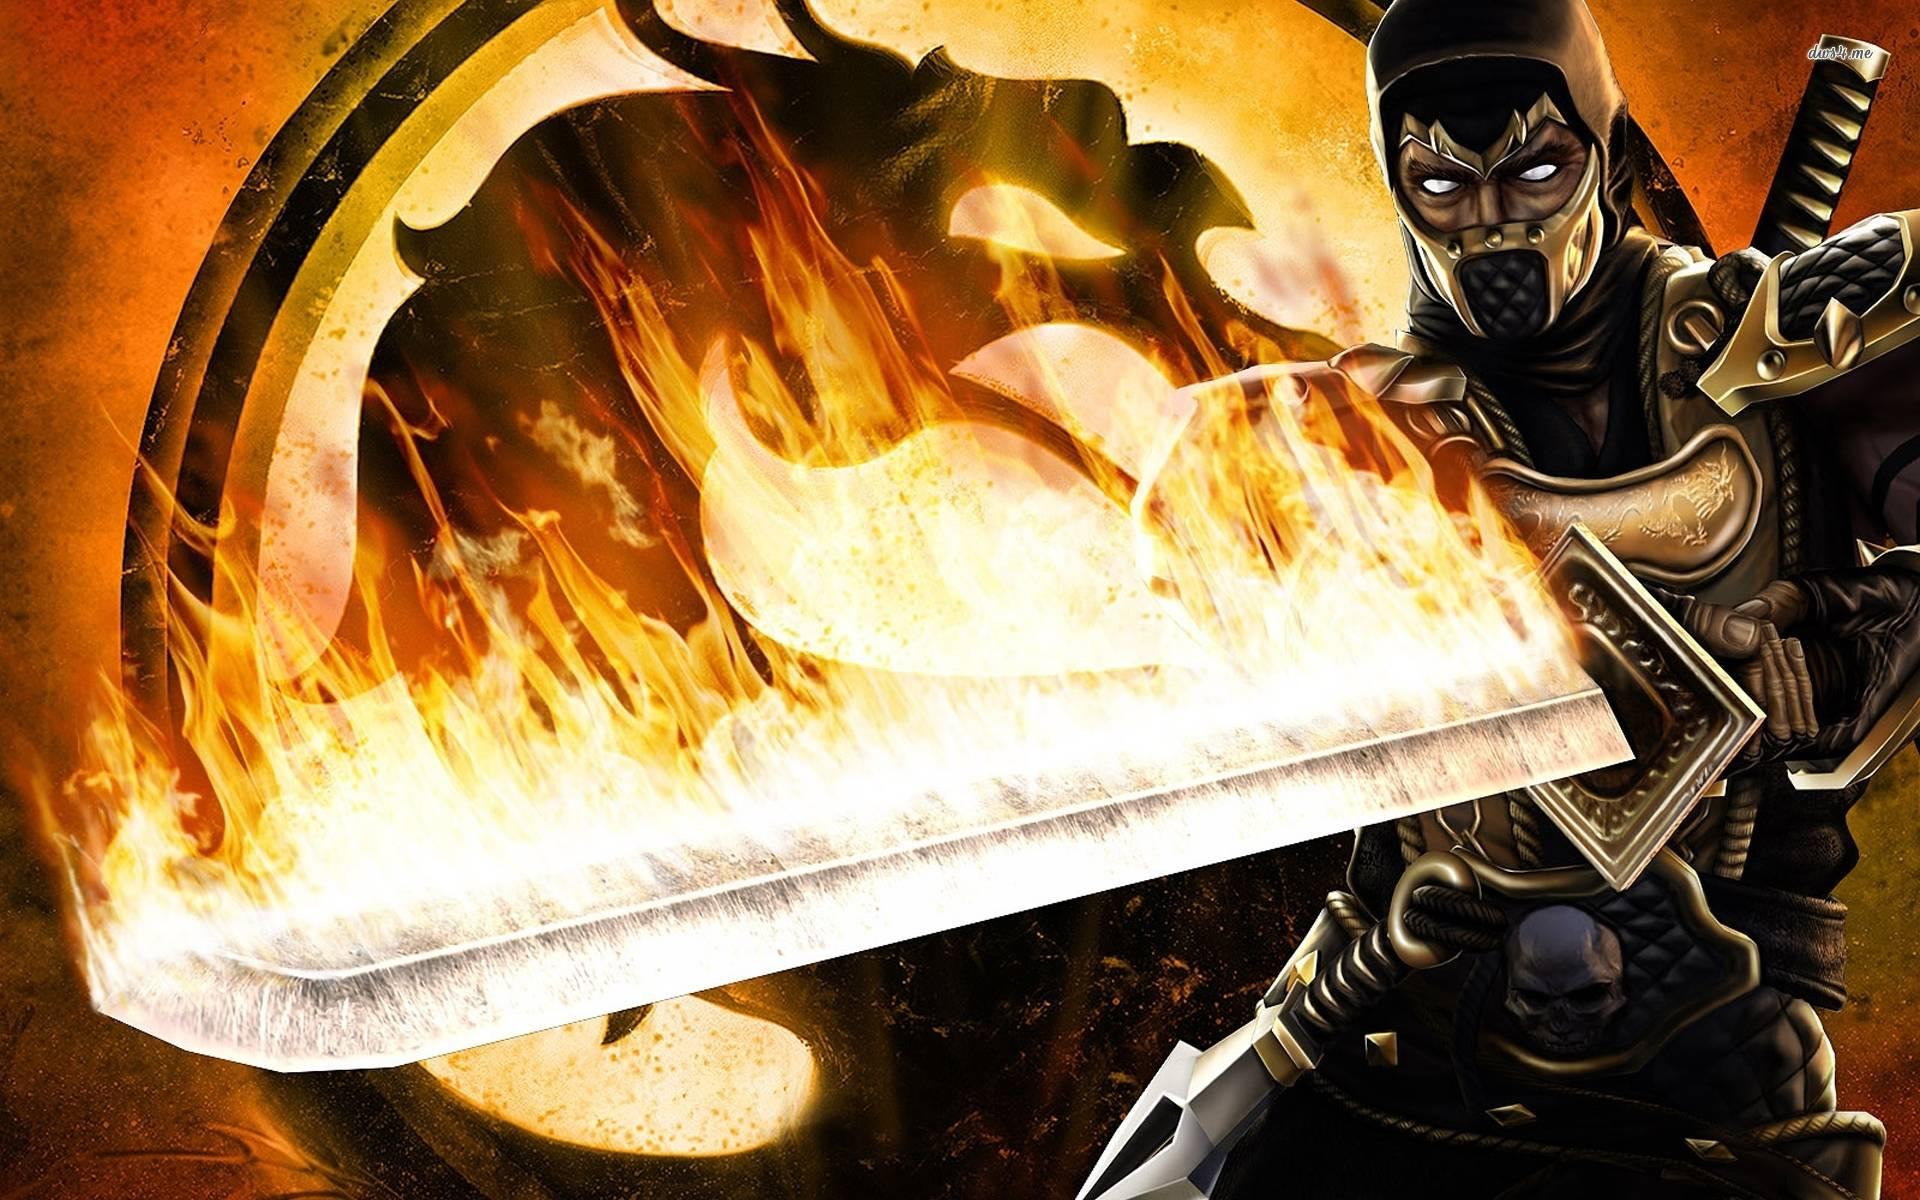 Mortal Kombat Wallpaper Scorpion 1920x1200